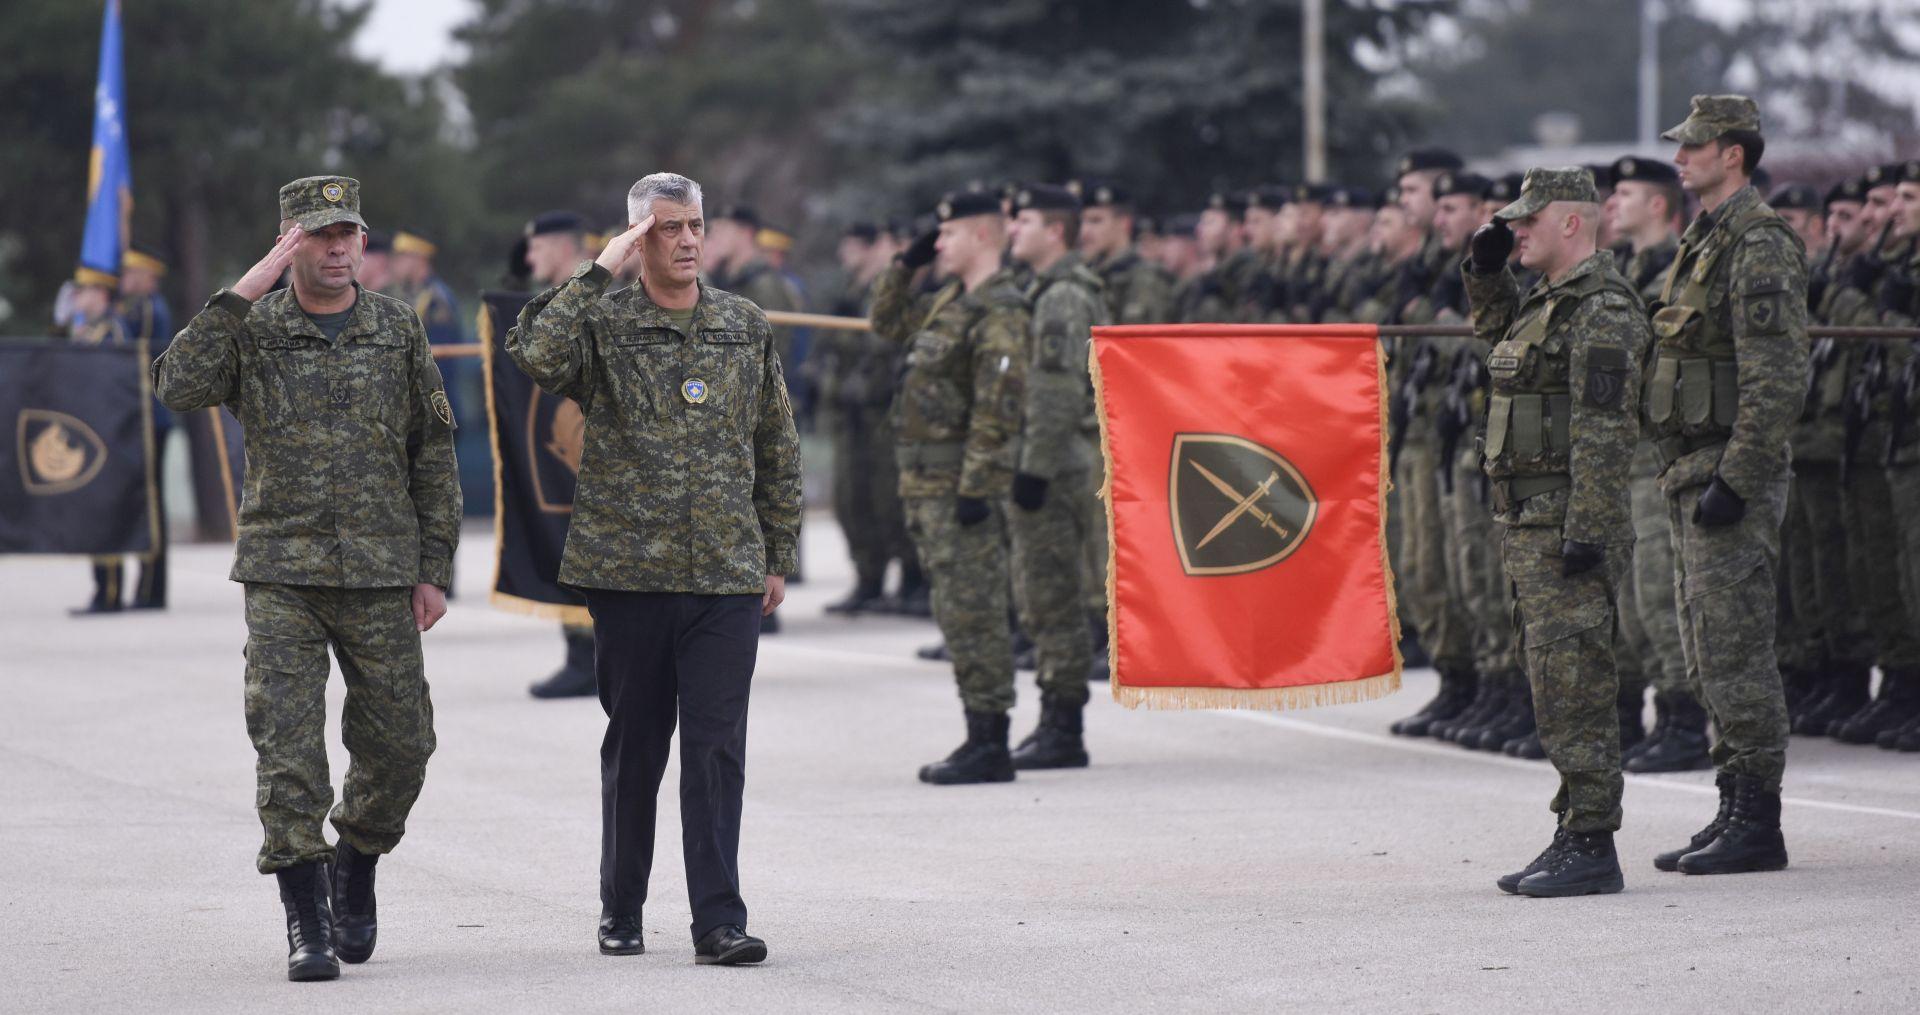 Skupština Kosova usvojila zakone vezane uz formiranje vojske